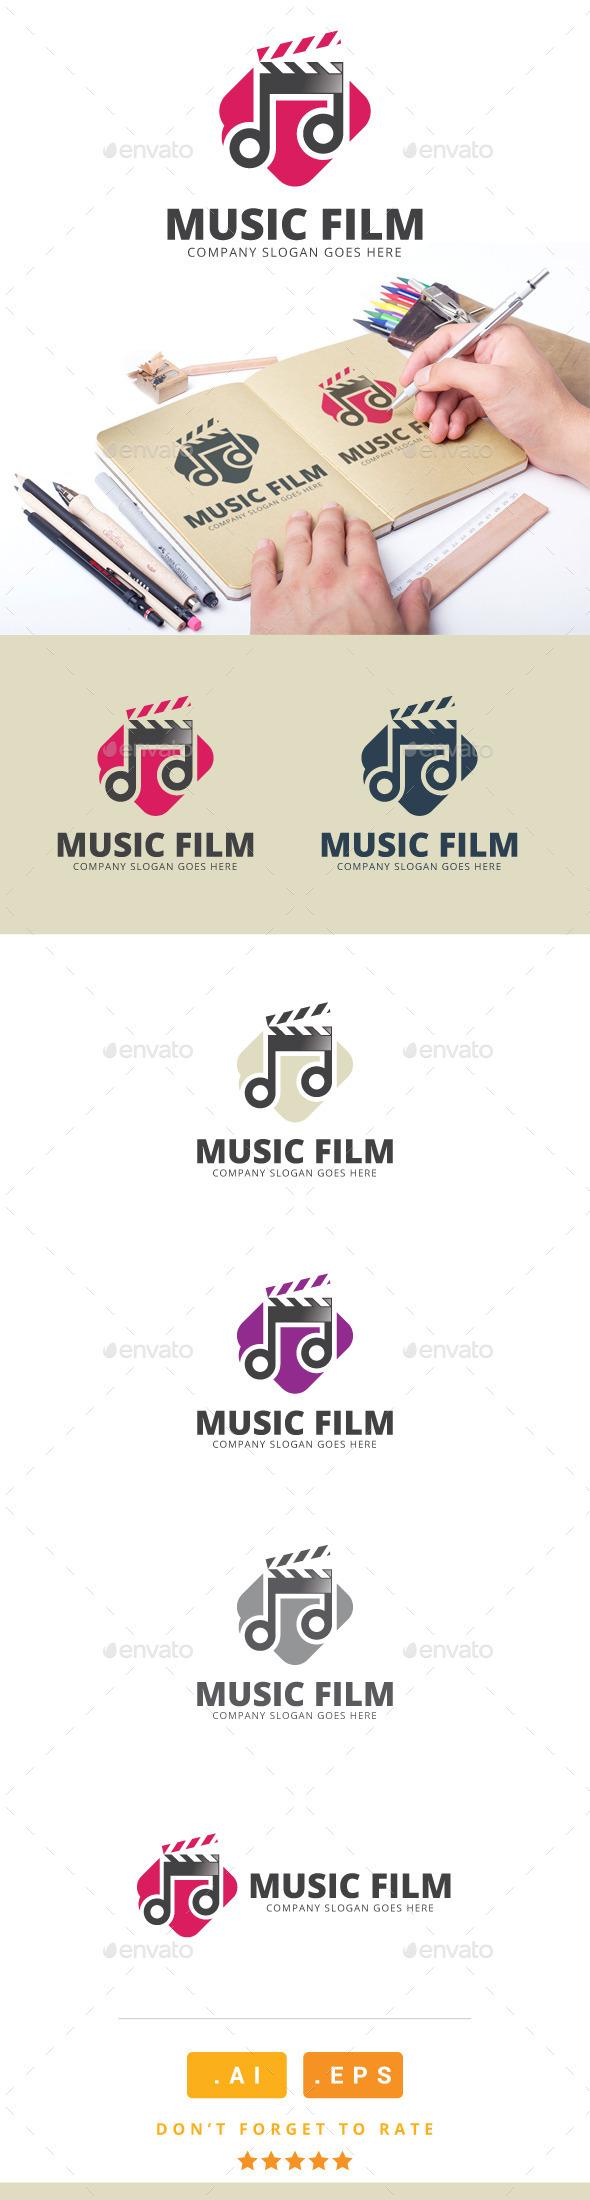 Music Film Logo